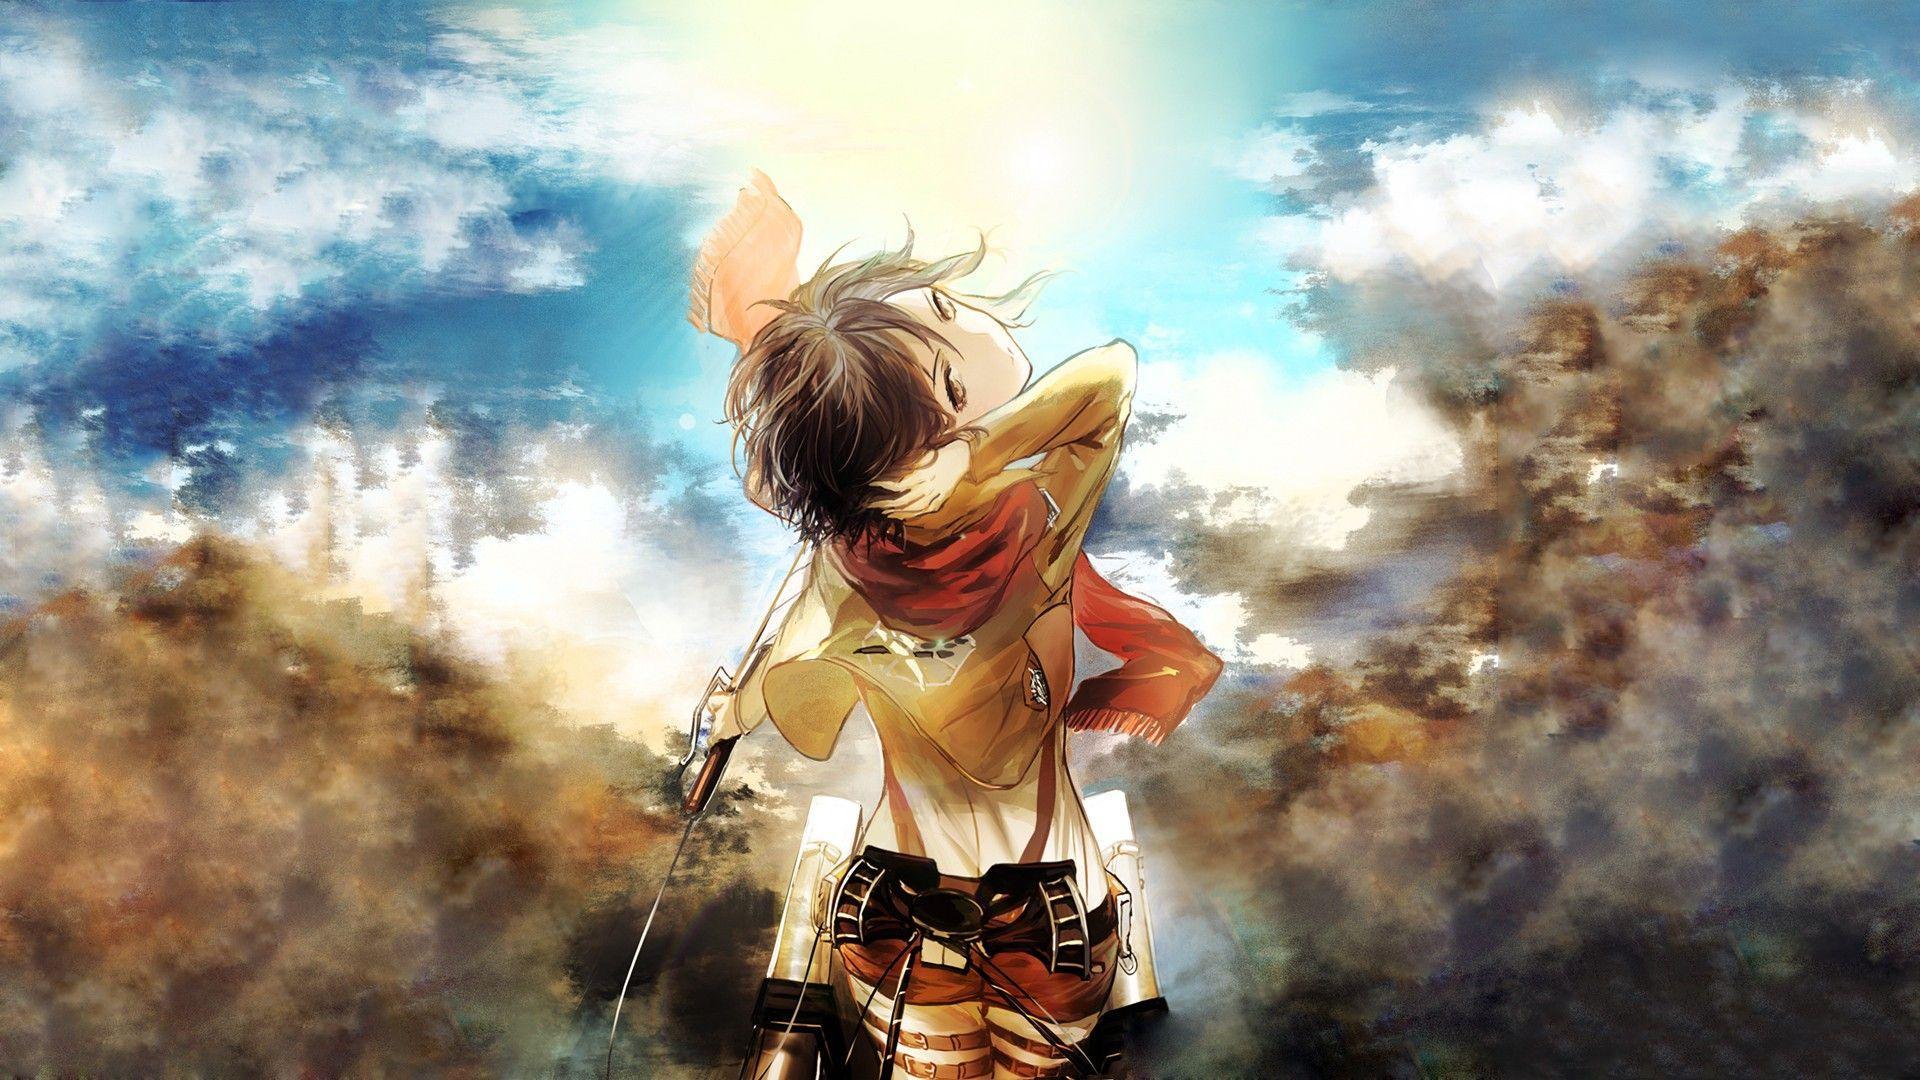 Download 9000+ Wallpaper Anime Art Hd HD